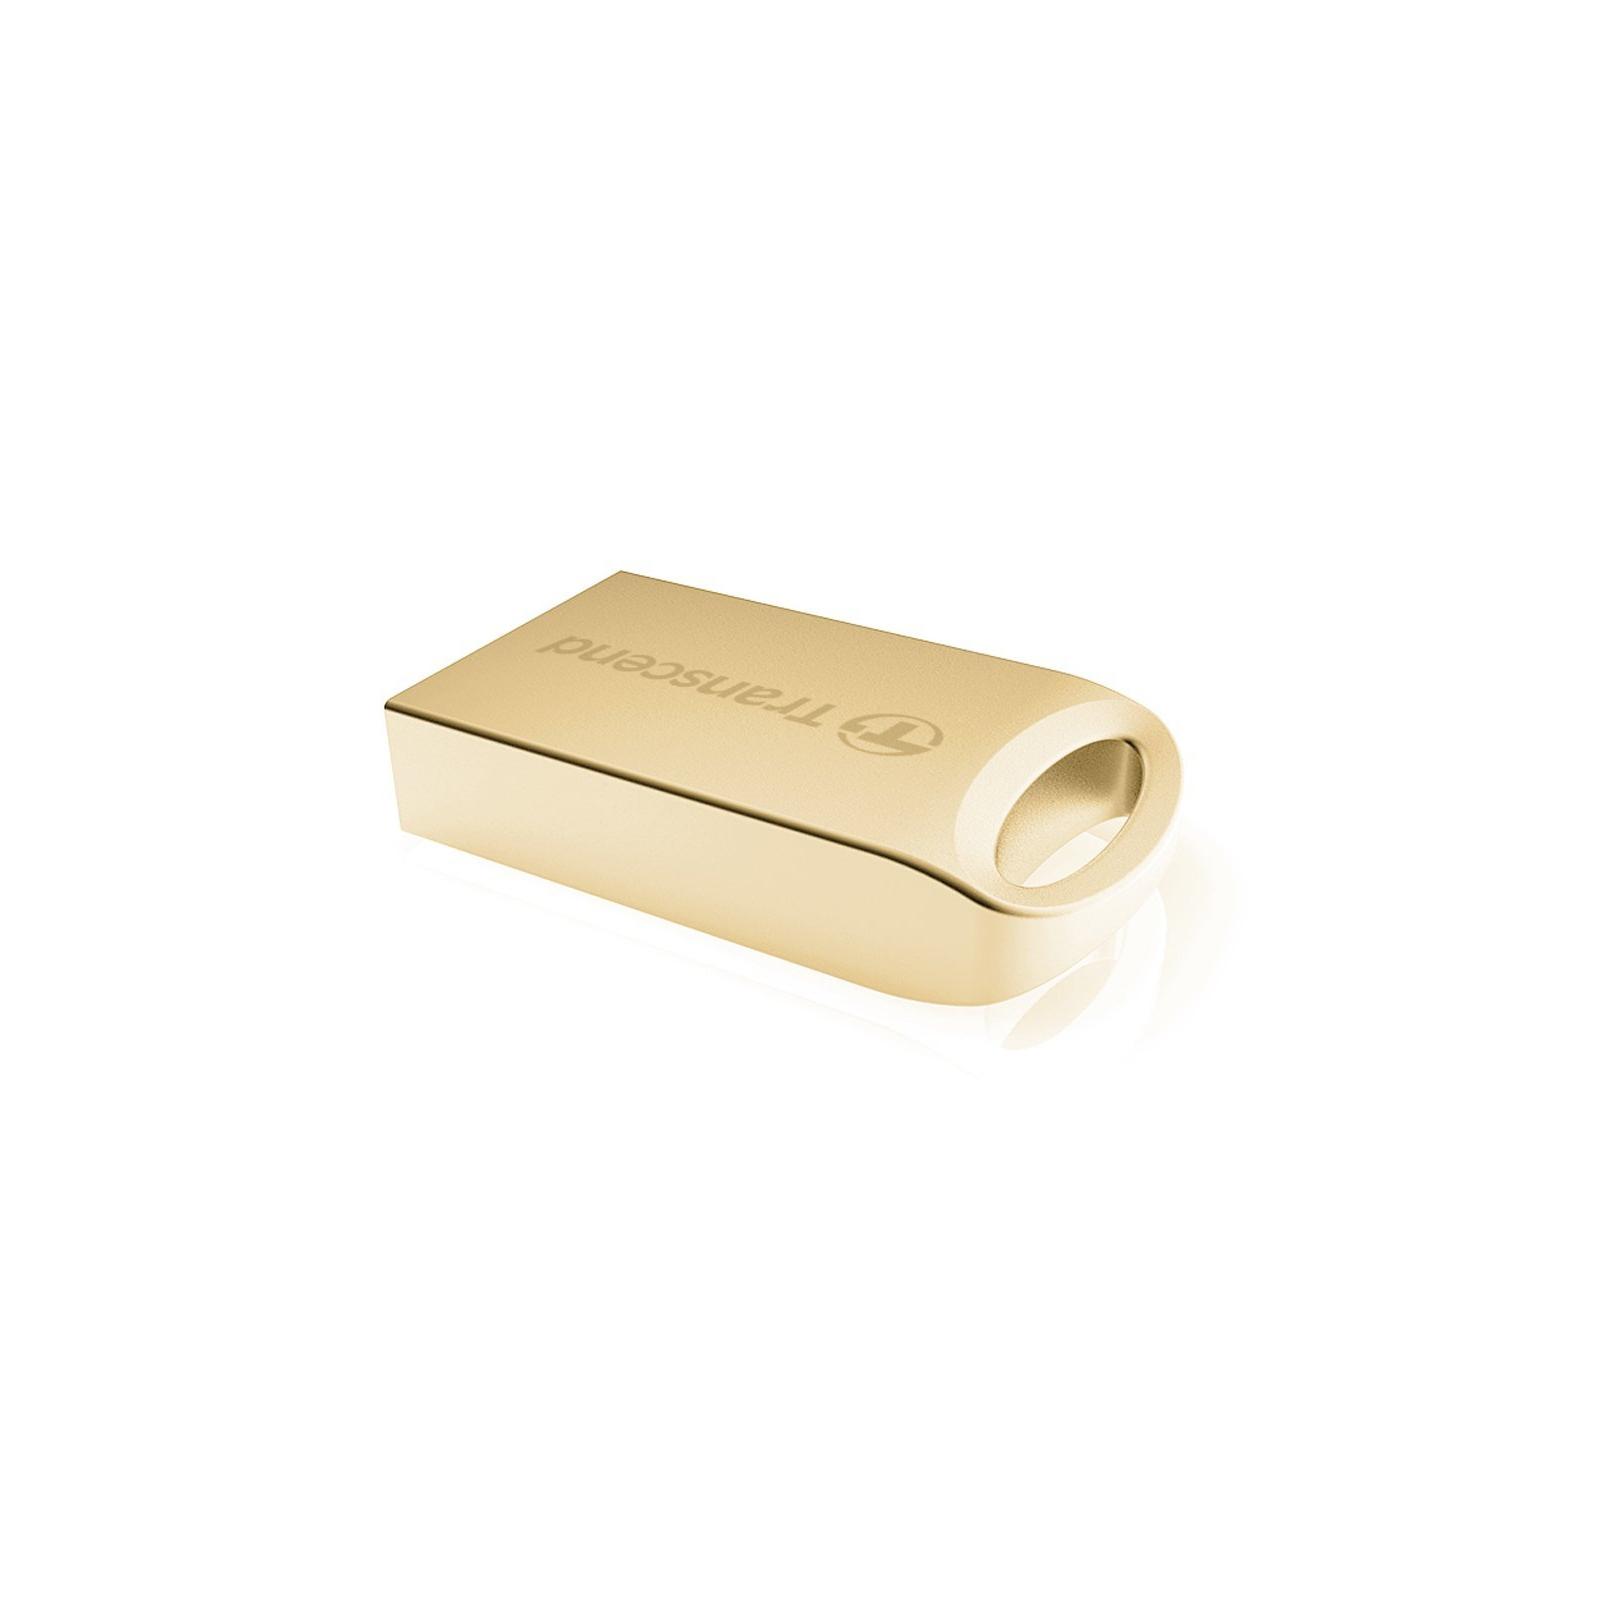 USB флеш накопитель Transcend JetFlash 510, Gold Plating (TS16GJF510G) изображение 2